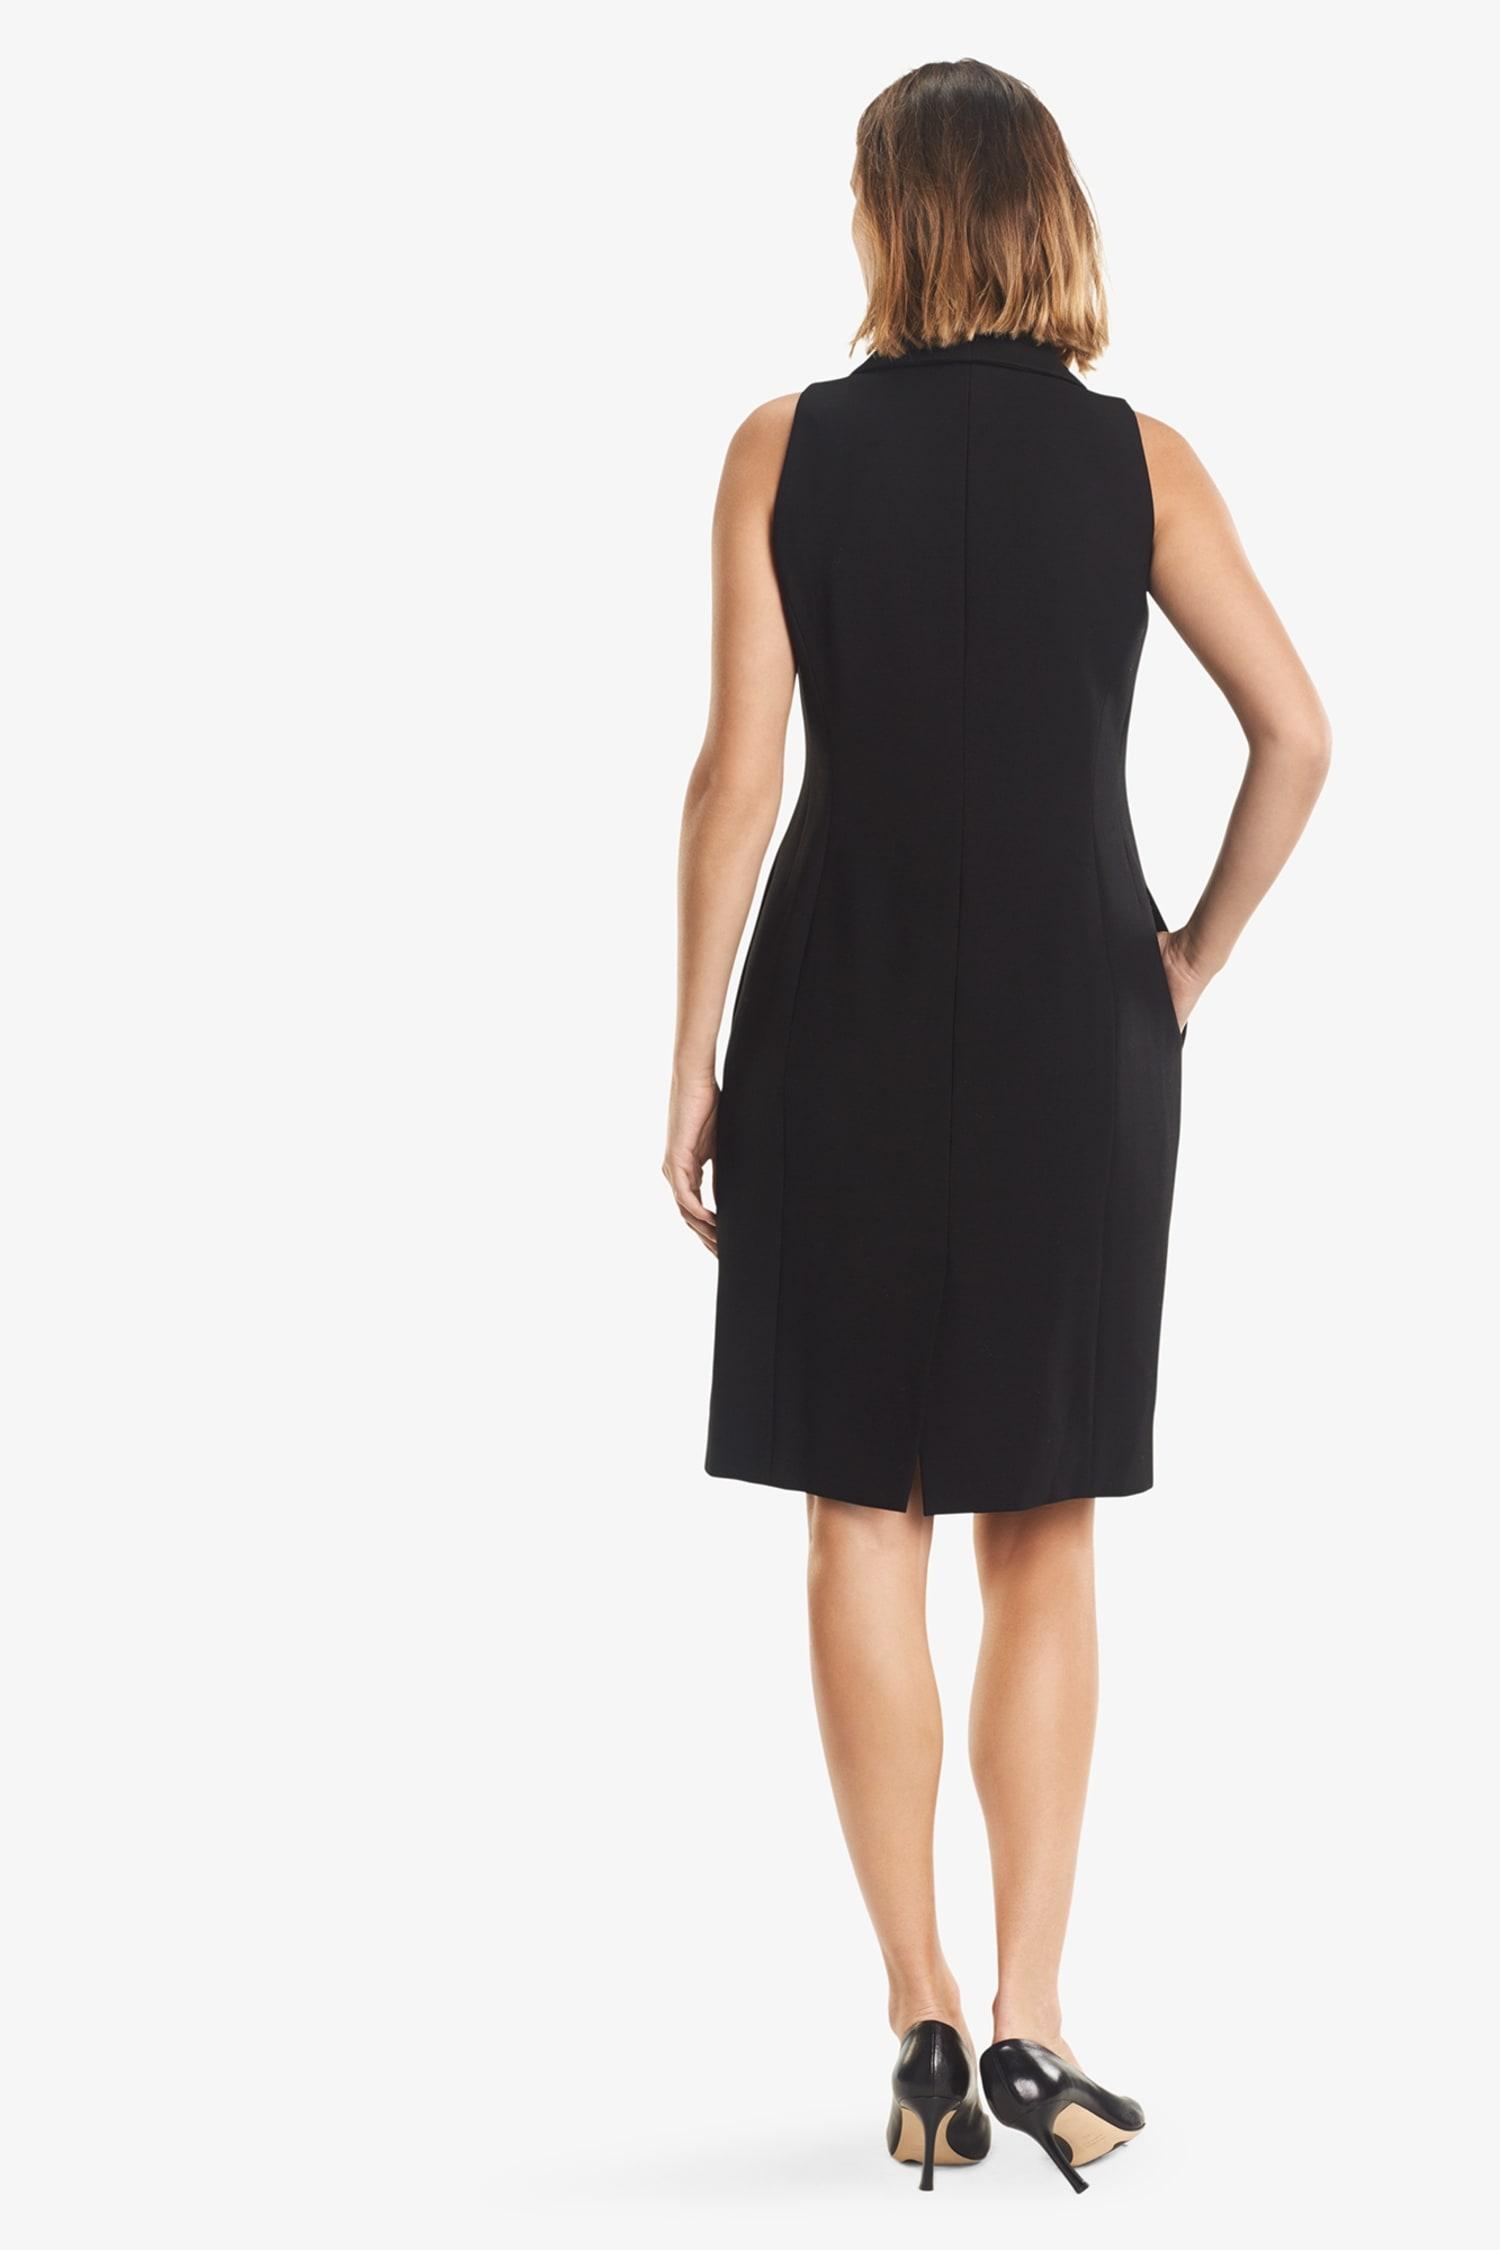 59b8e8dd388 Dana Dress—Tuxedo    Black 3